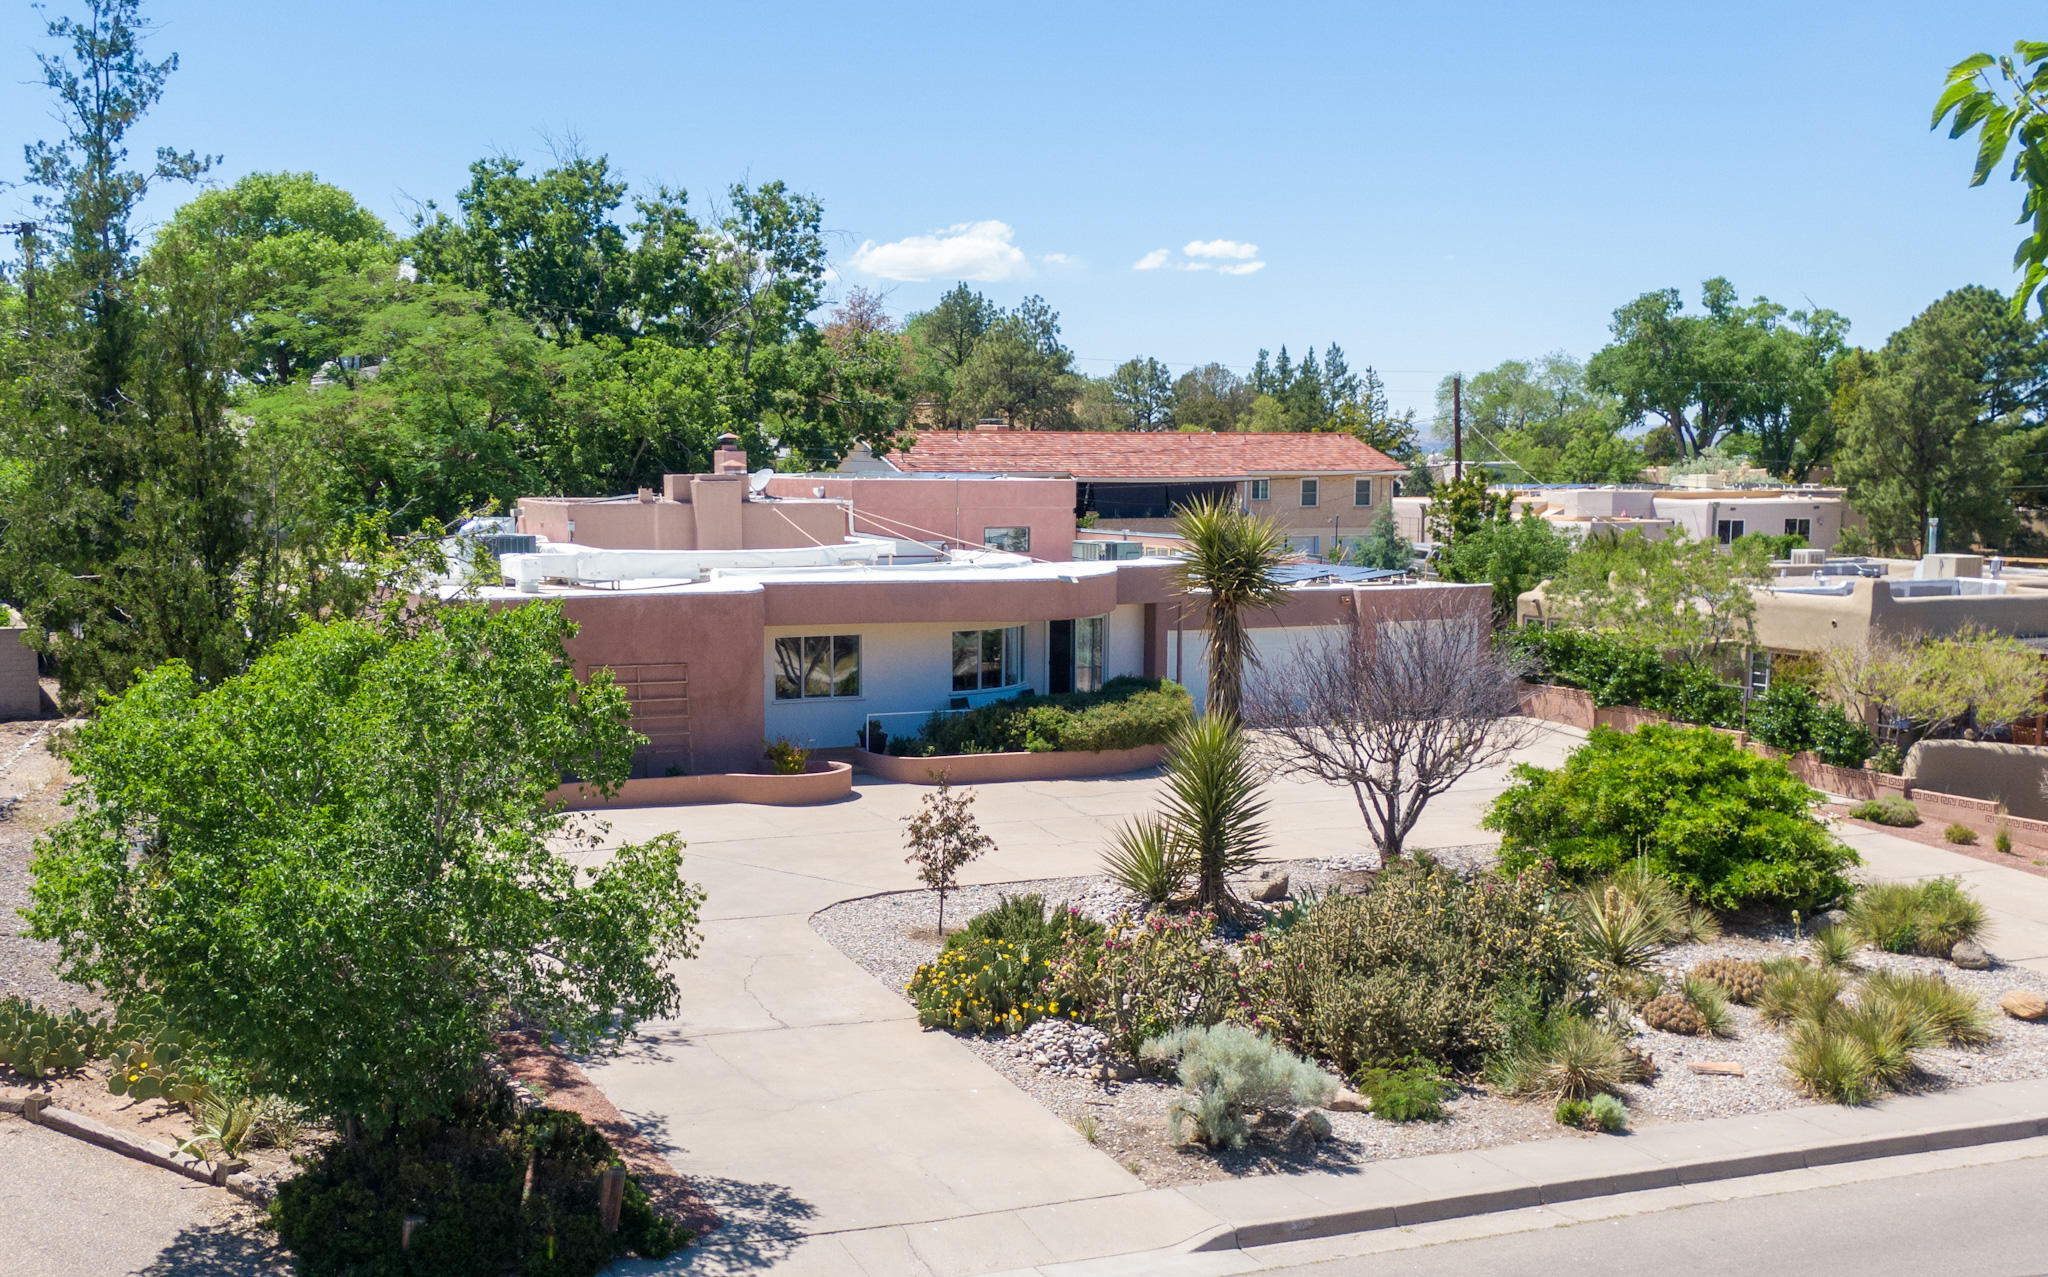 317 Solano Drive SE, Albuquerque, NM 87108 - Albuquerque, NM real estate listing